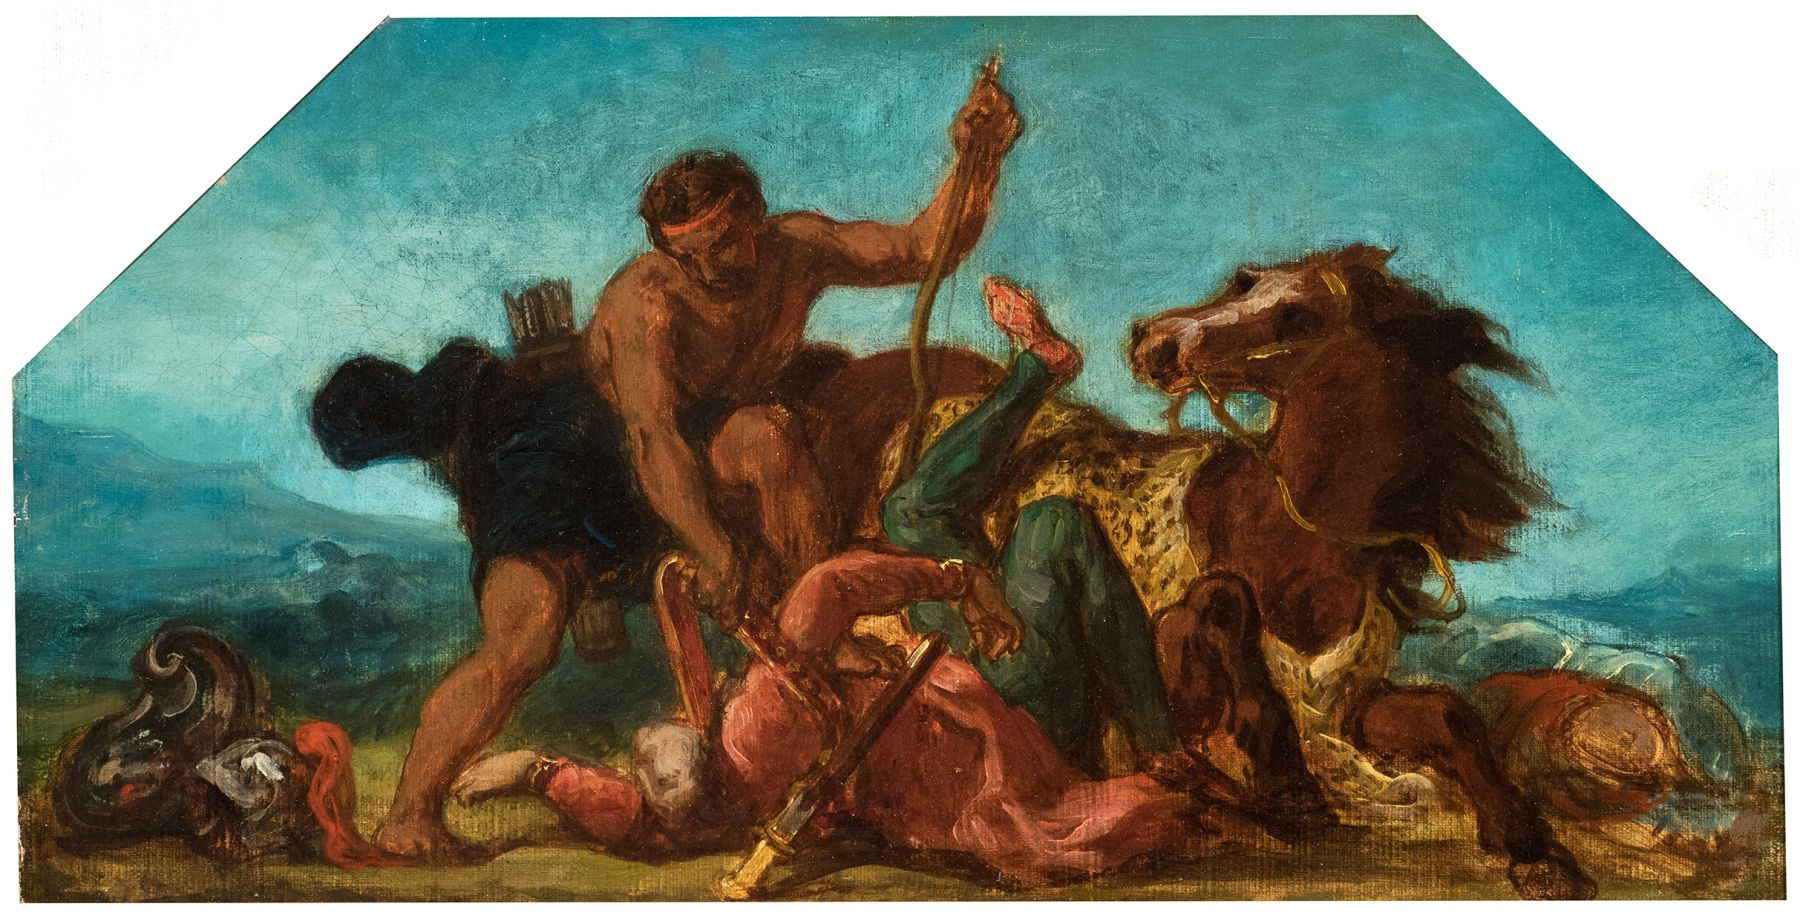 Eugene delacroix Hercules and Hippolyte, Study for a Lunette of The Salon de la Paix    Oil on canvas 9 5/8 x 18 5/8 inches